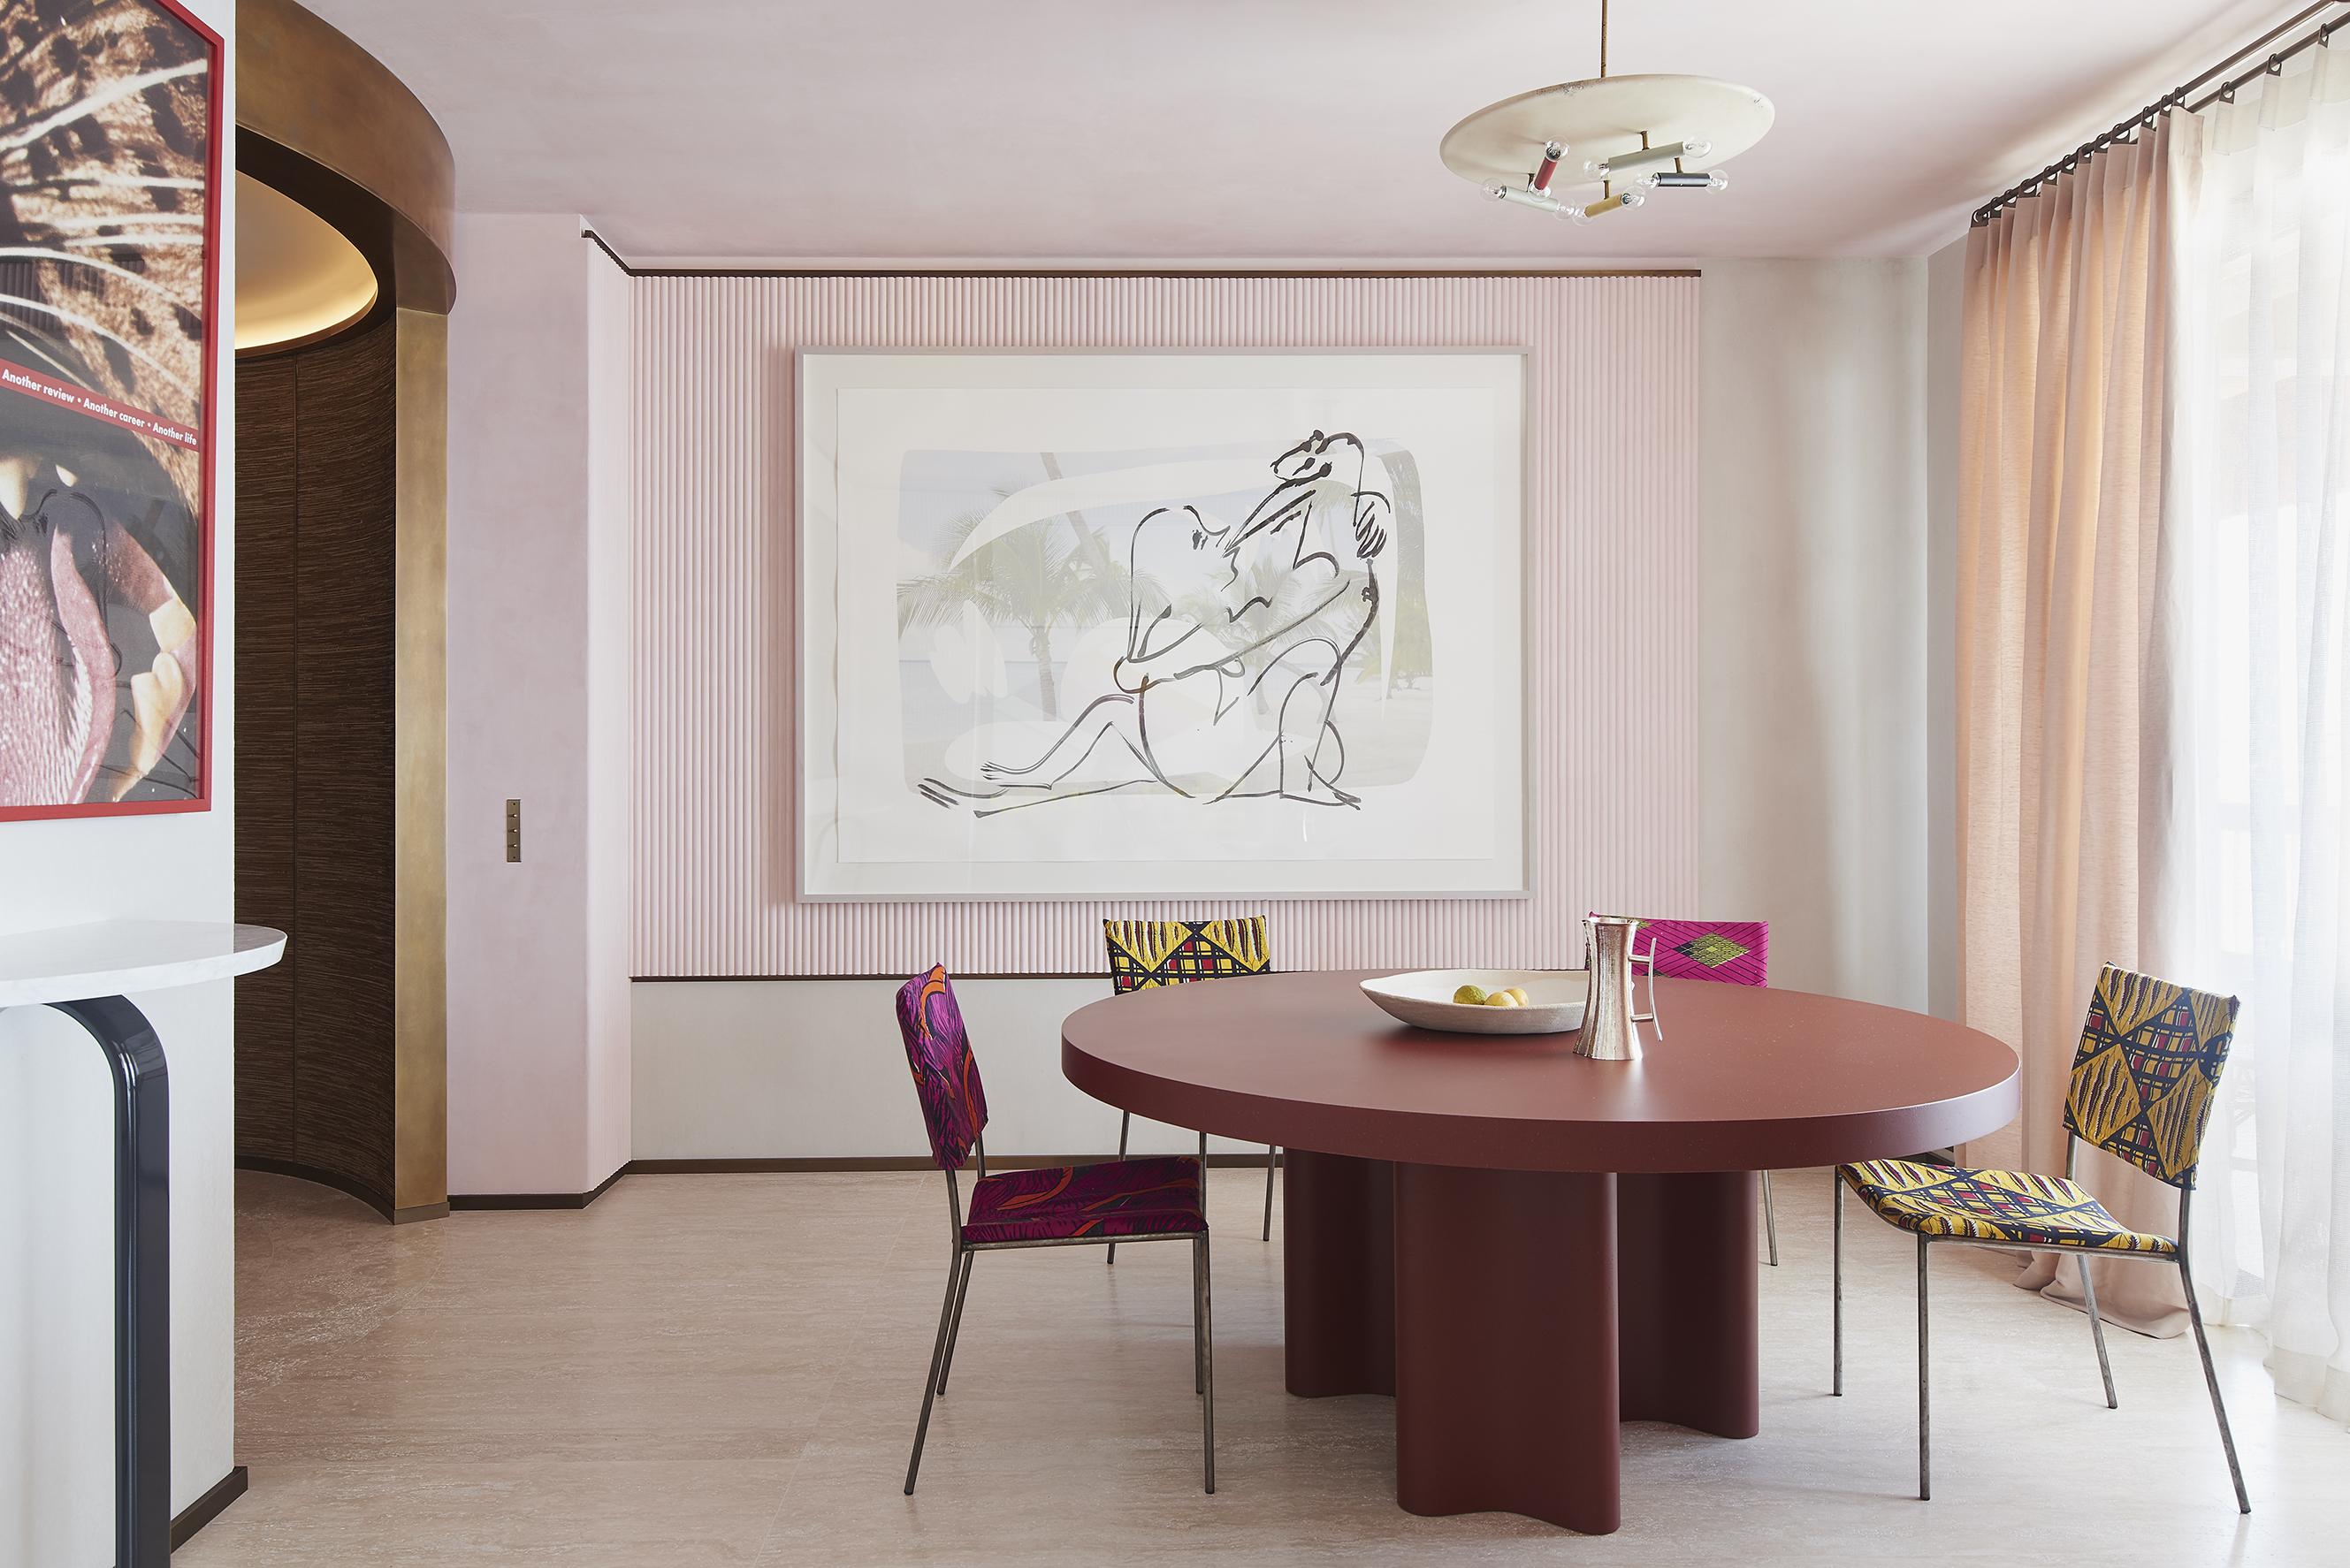 002-Rodolphe_Parente_Appartement_Sud